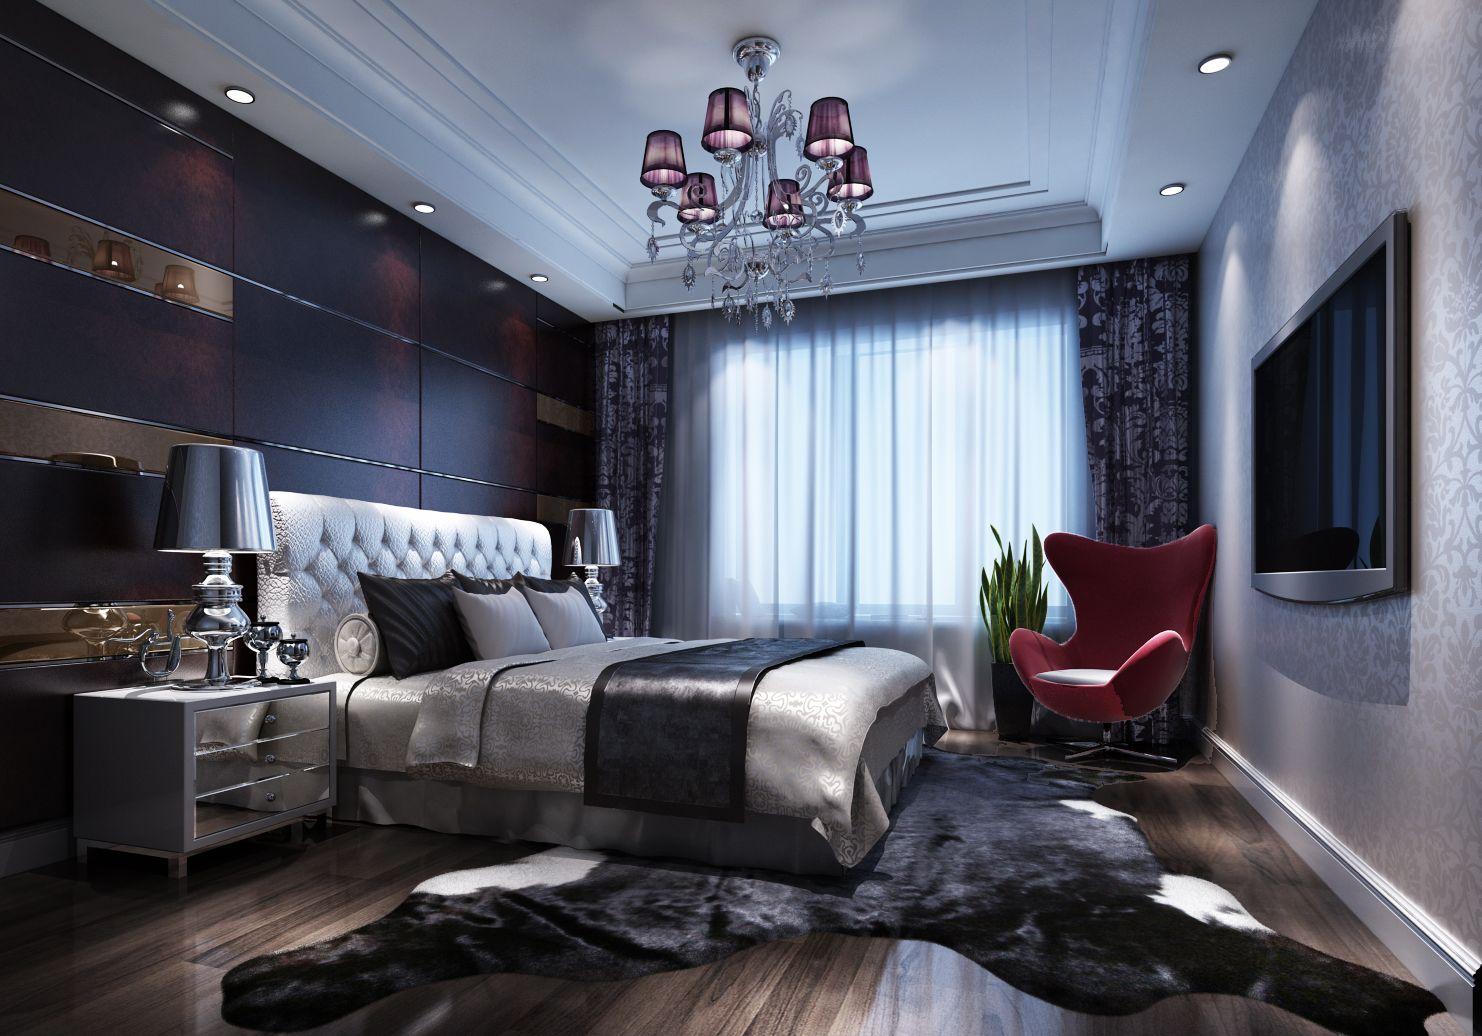 Pin By Mohamed Shamsul Nizam On My Bedroom Luxury Bedroom Furniture